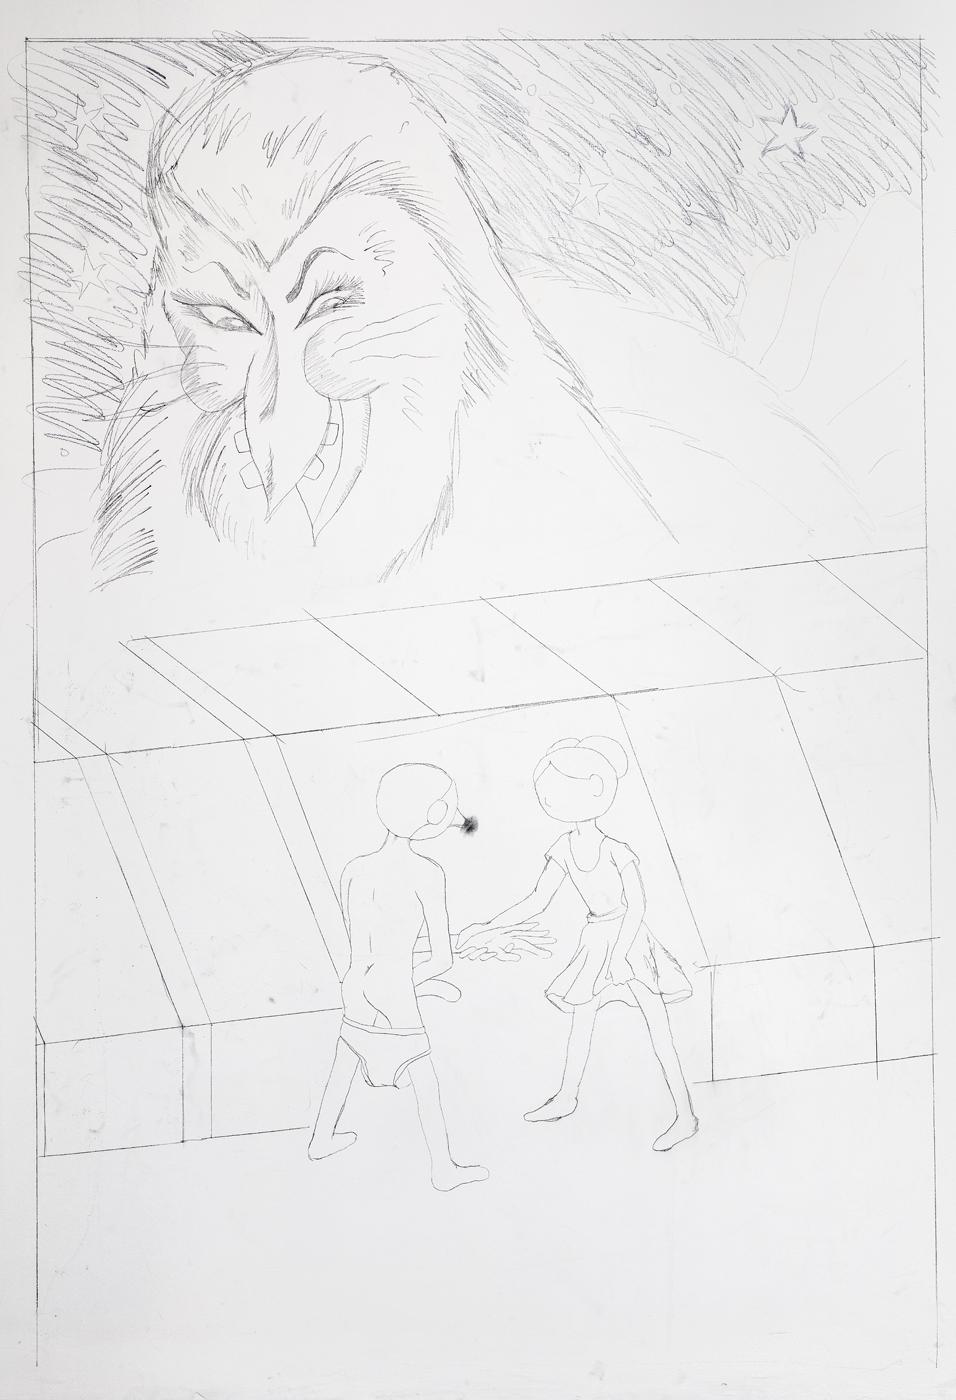 Gobby_Wall_Drawing_2.jpg